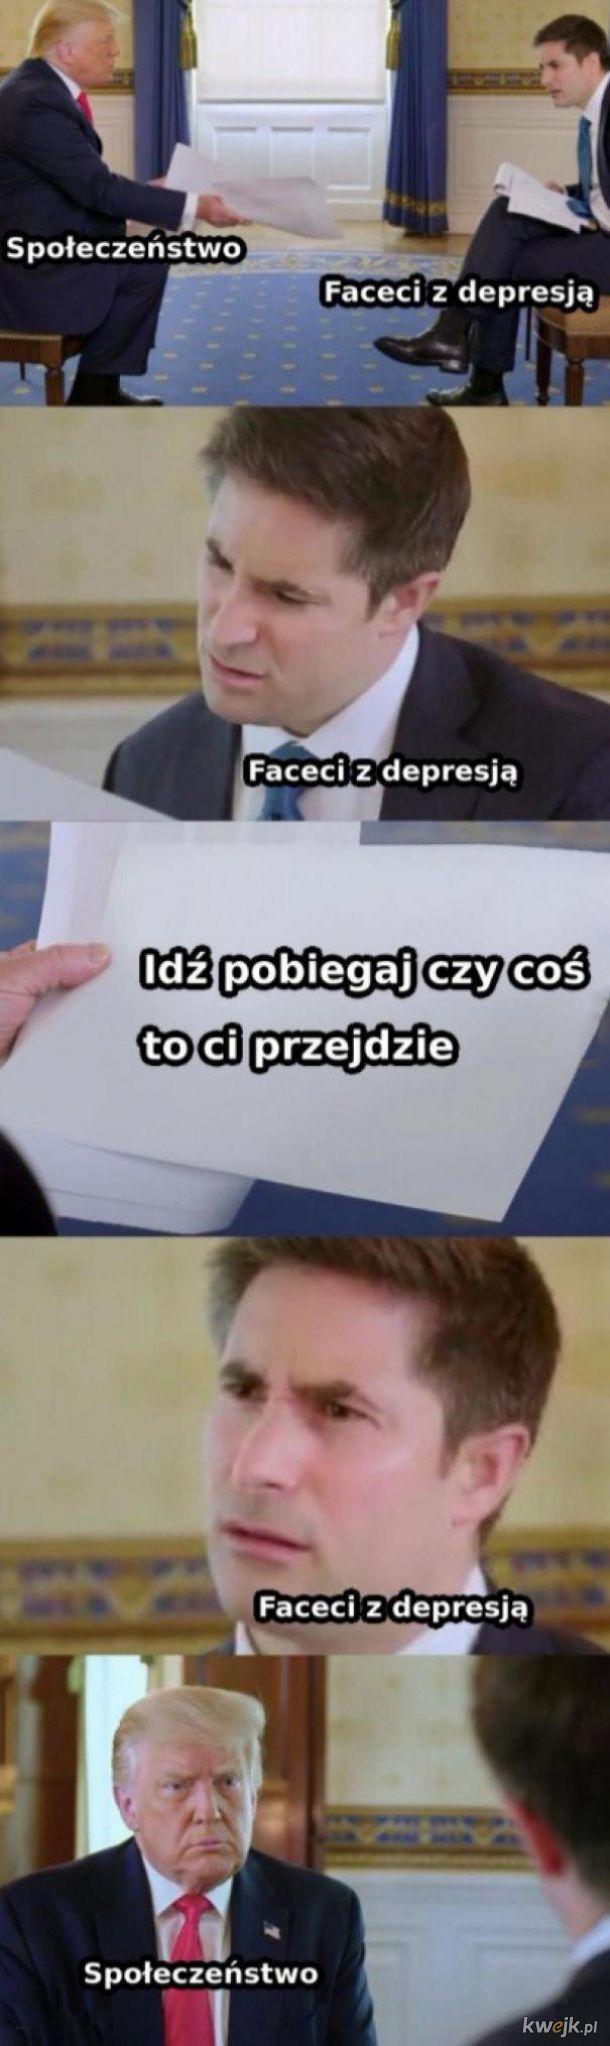 Facet z depresją